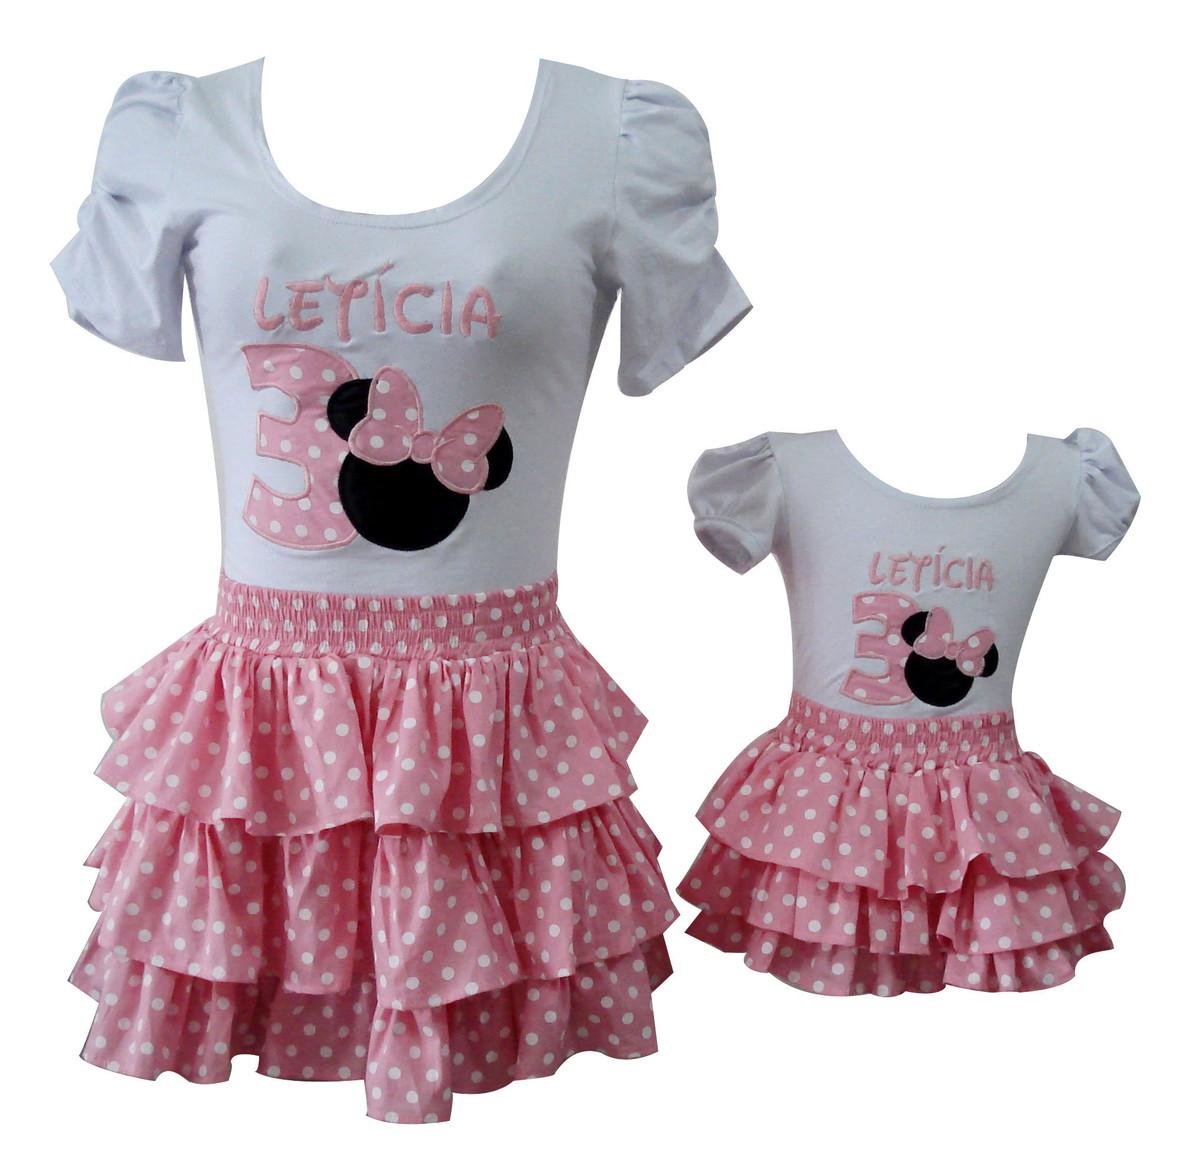 ... -minnie-rosa-mae-e-filha-1118-conjunto-minnie-rosa-mae-e-filha